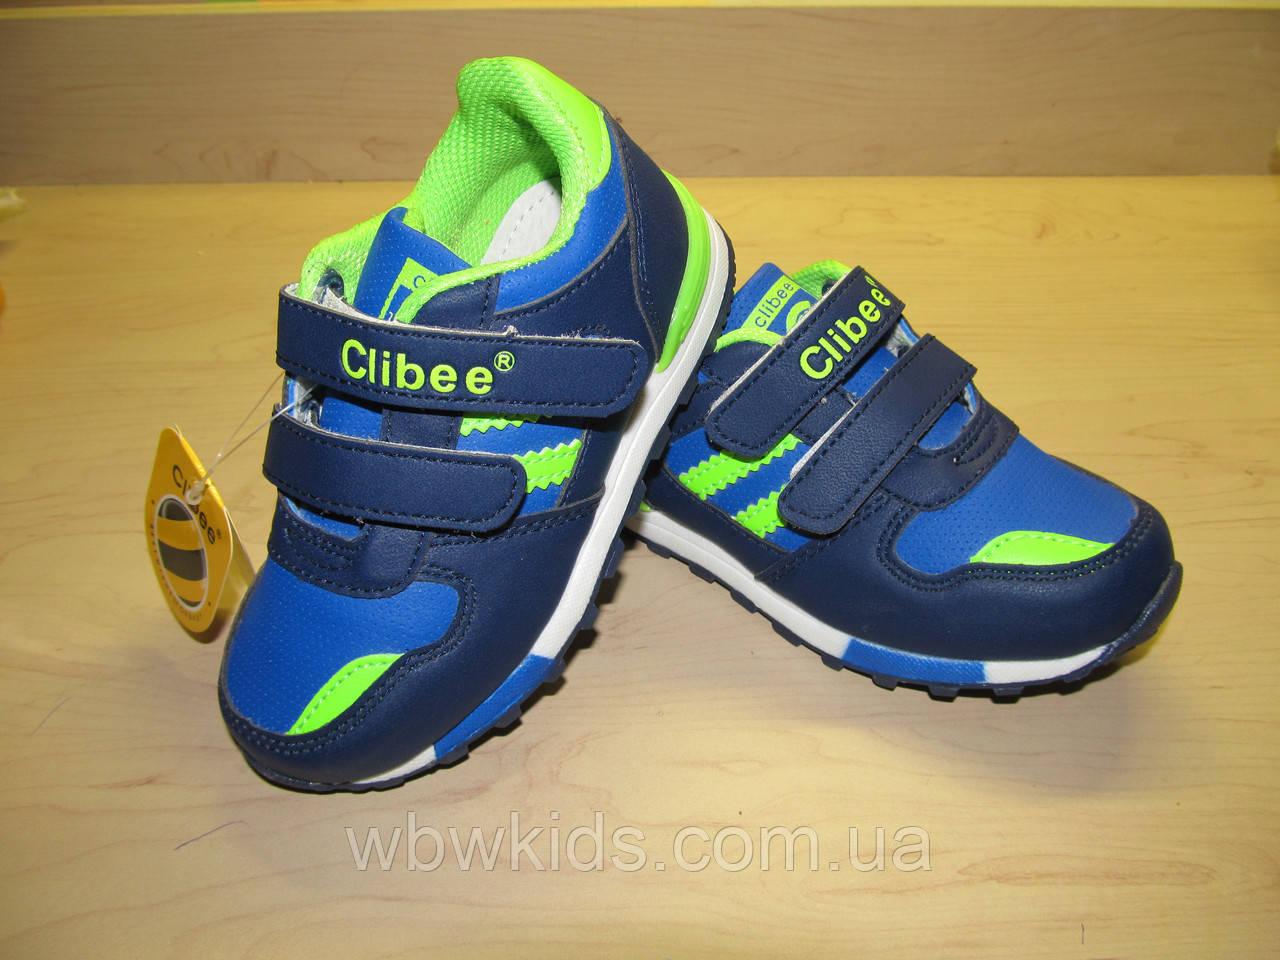 5e4f36d4f2aef5 Кросівки Clibee F627 синьо-зелені 26 р.: продажа, цена в Львові ...